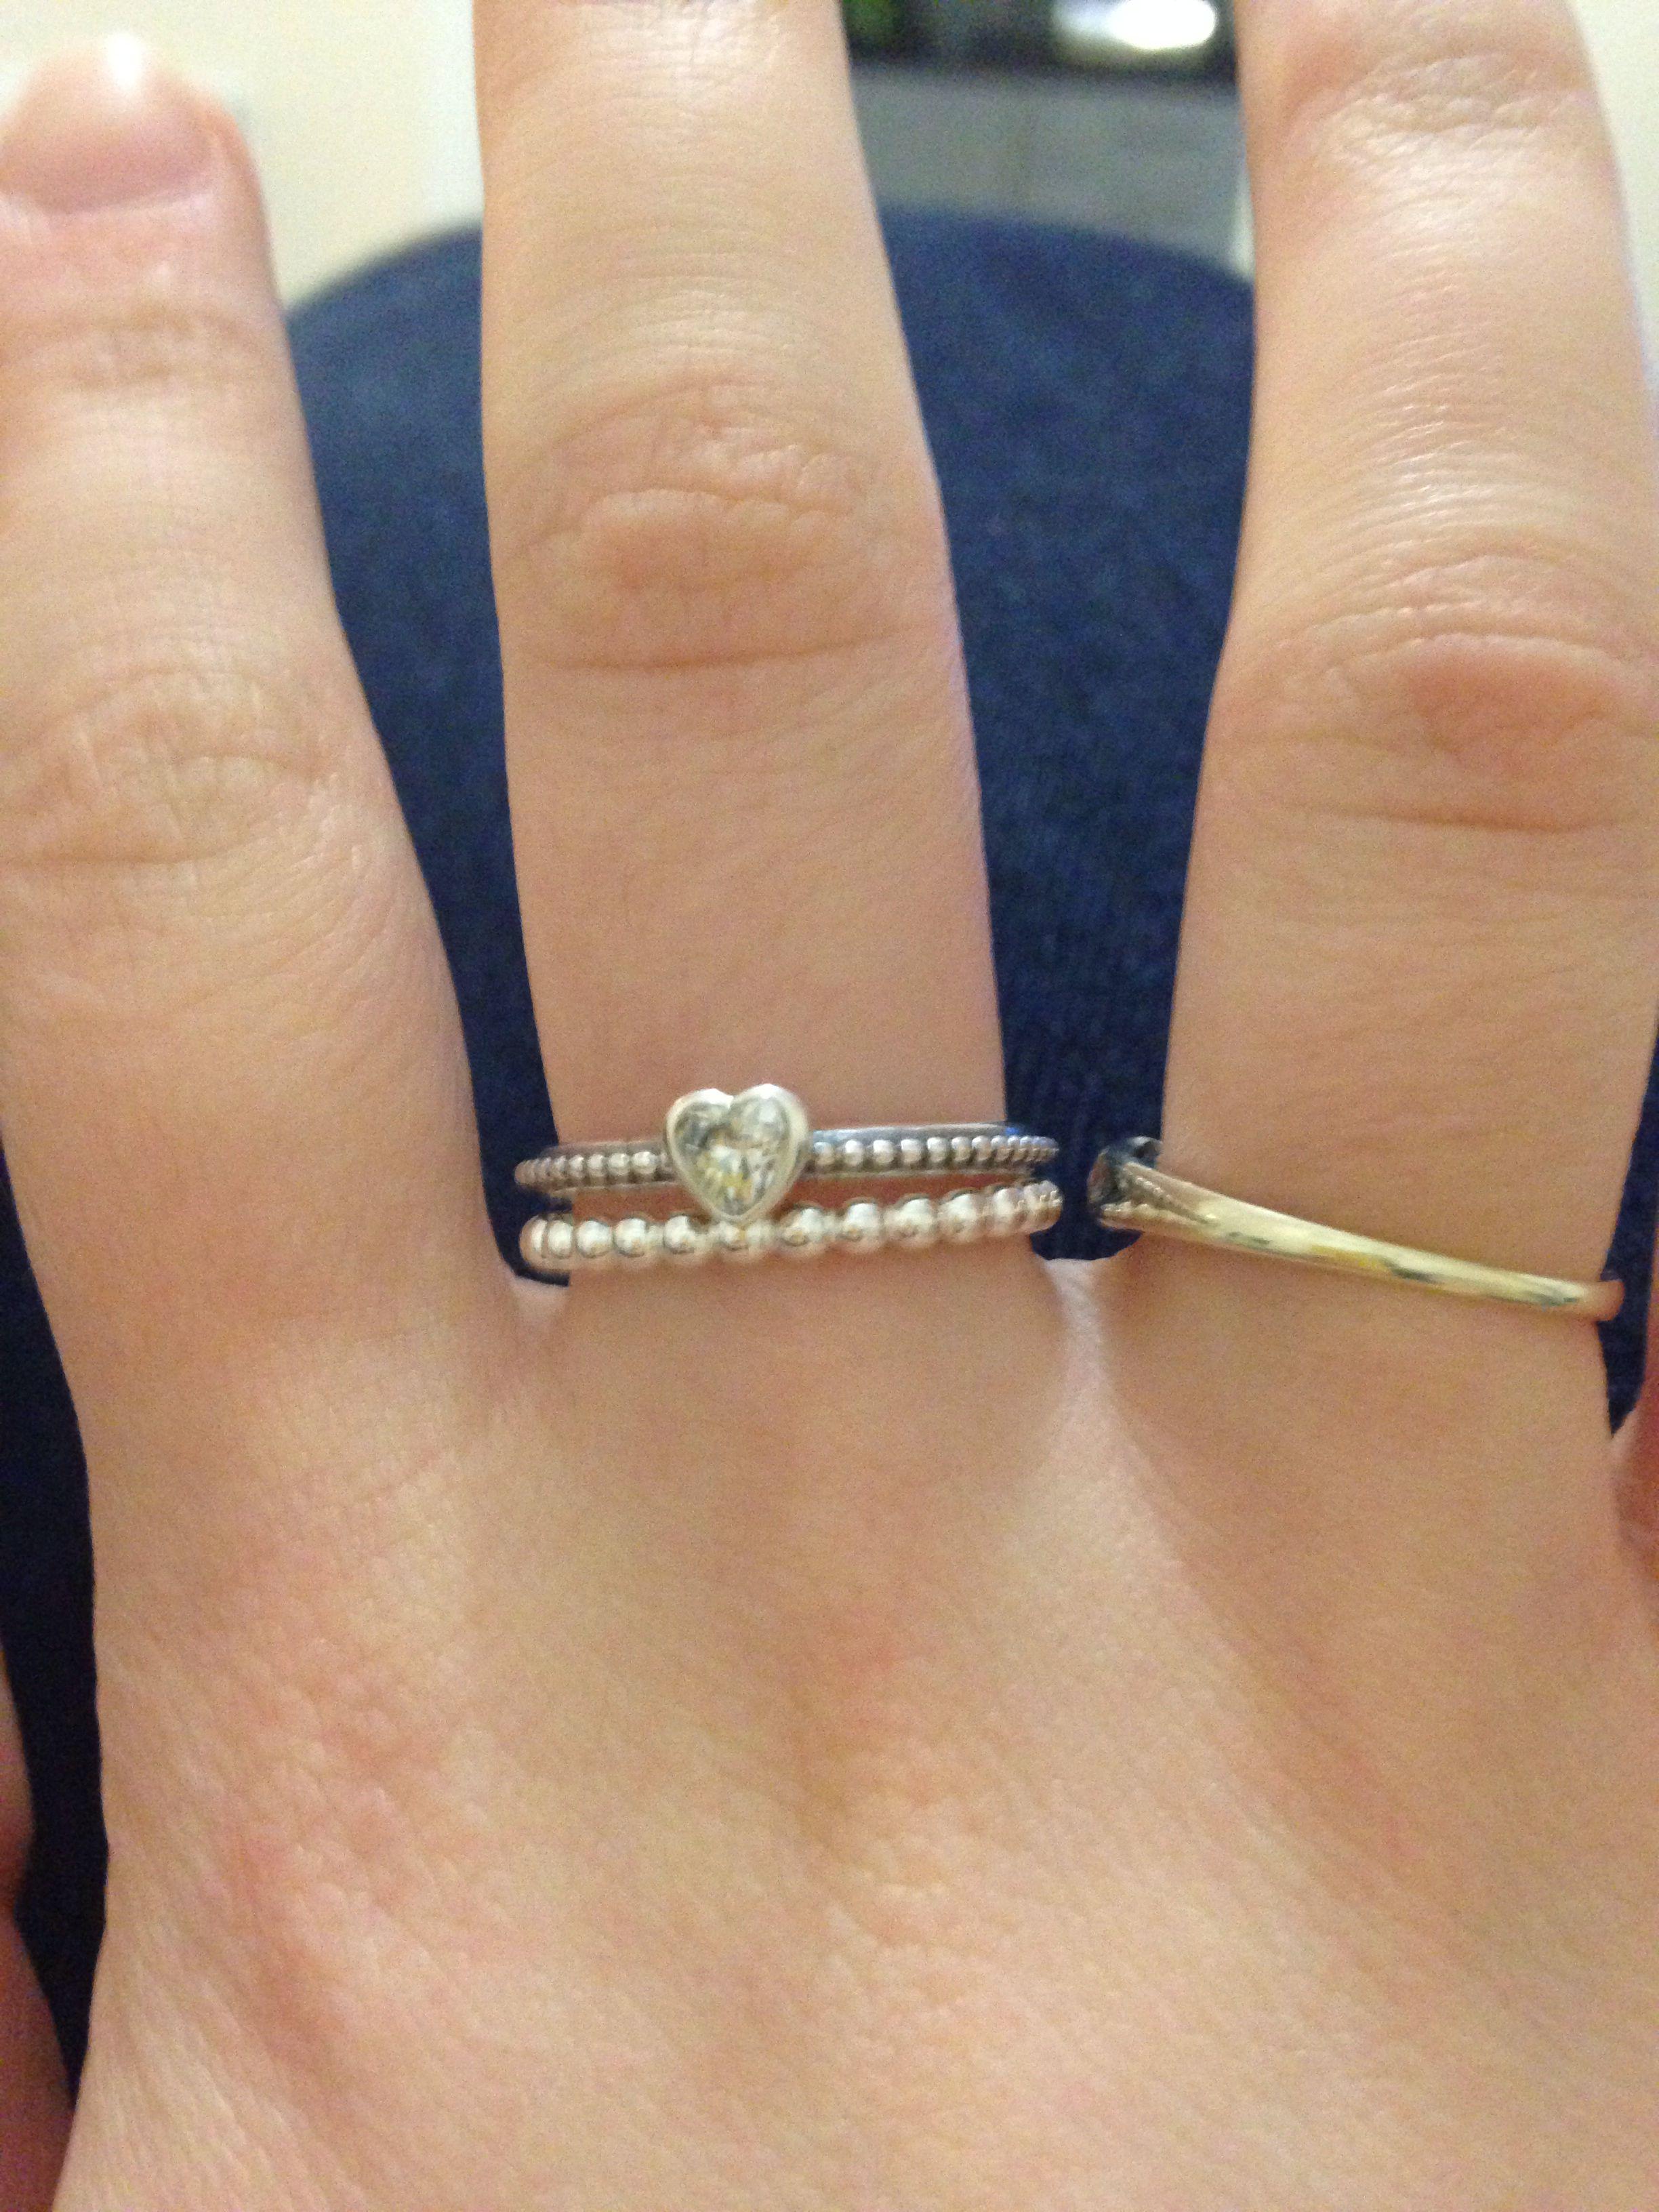 9fb345fe8 Pandora ring stack. Pretty. | Jewelry in 2019 | Pandora rings ...